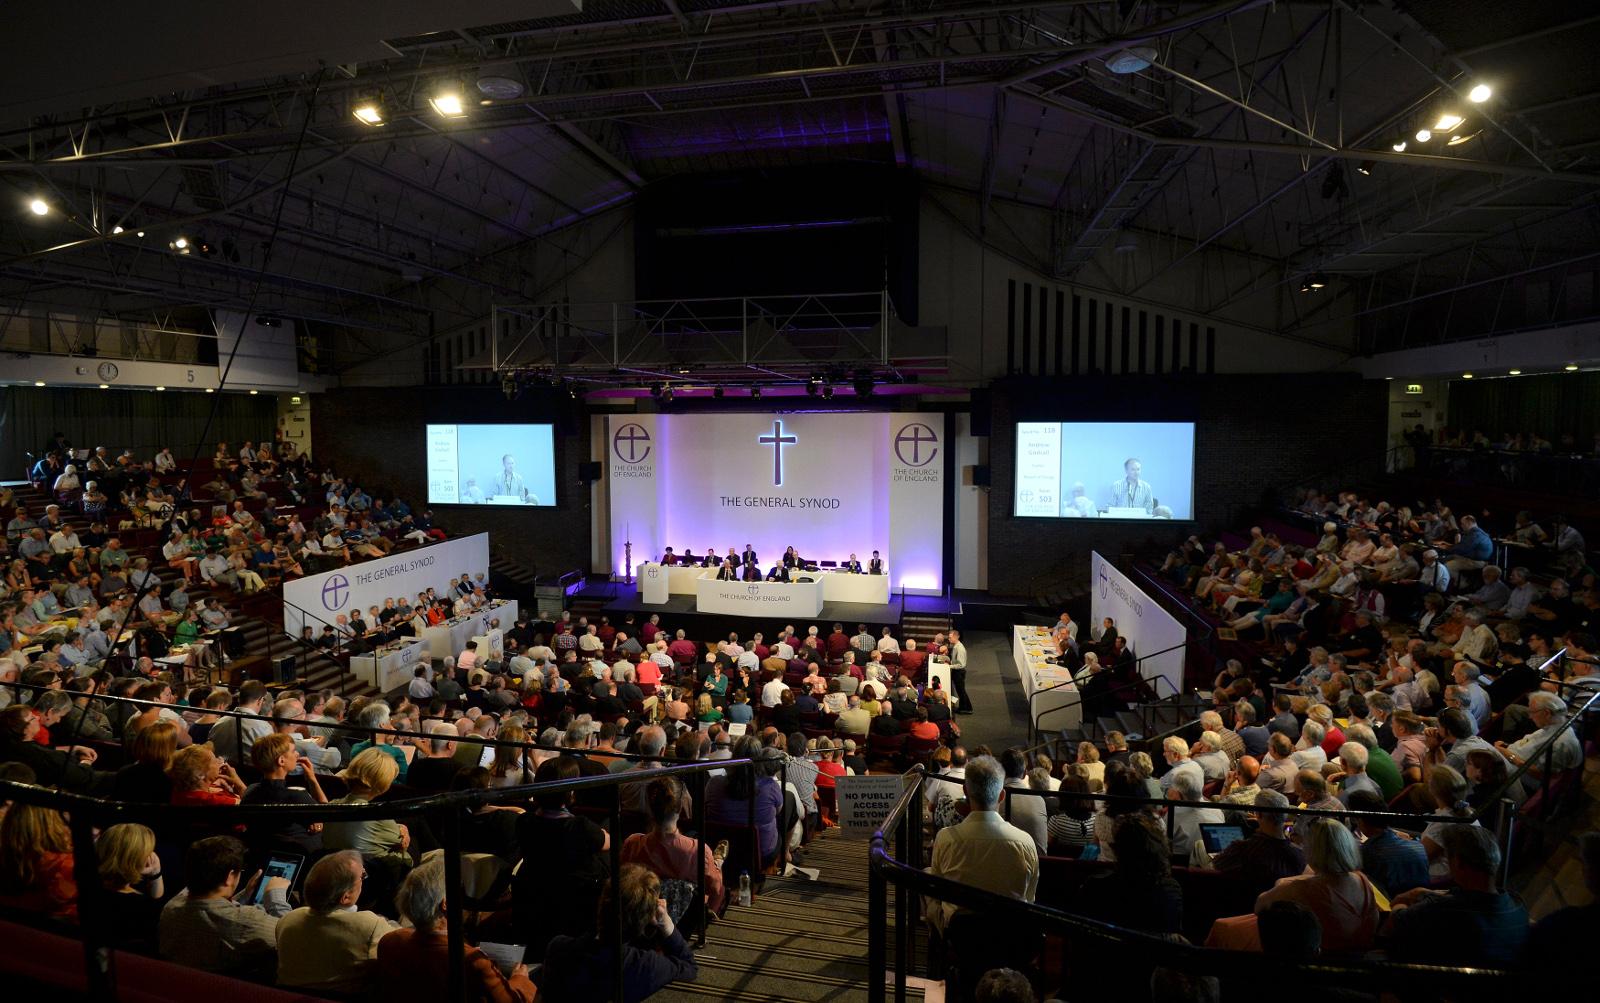 Church of England synod meeting